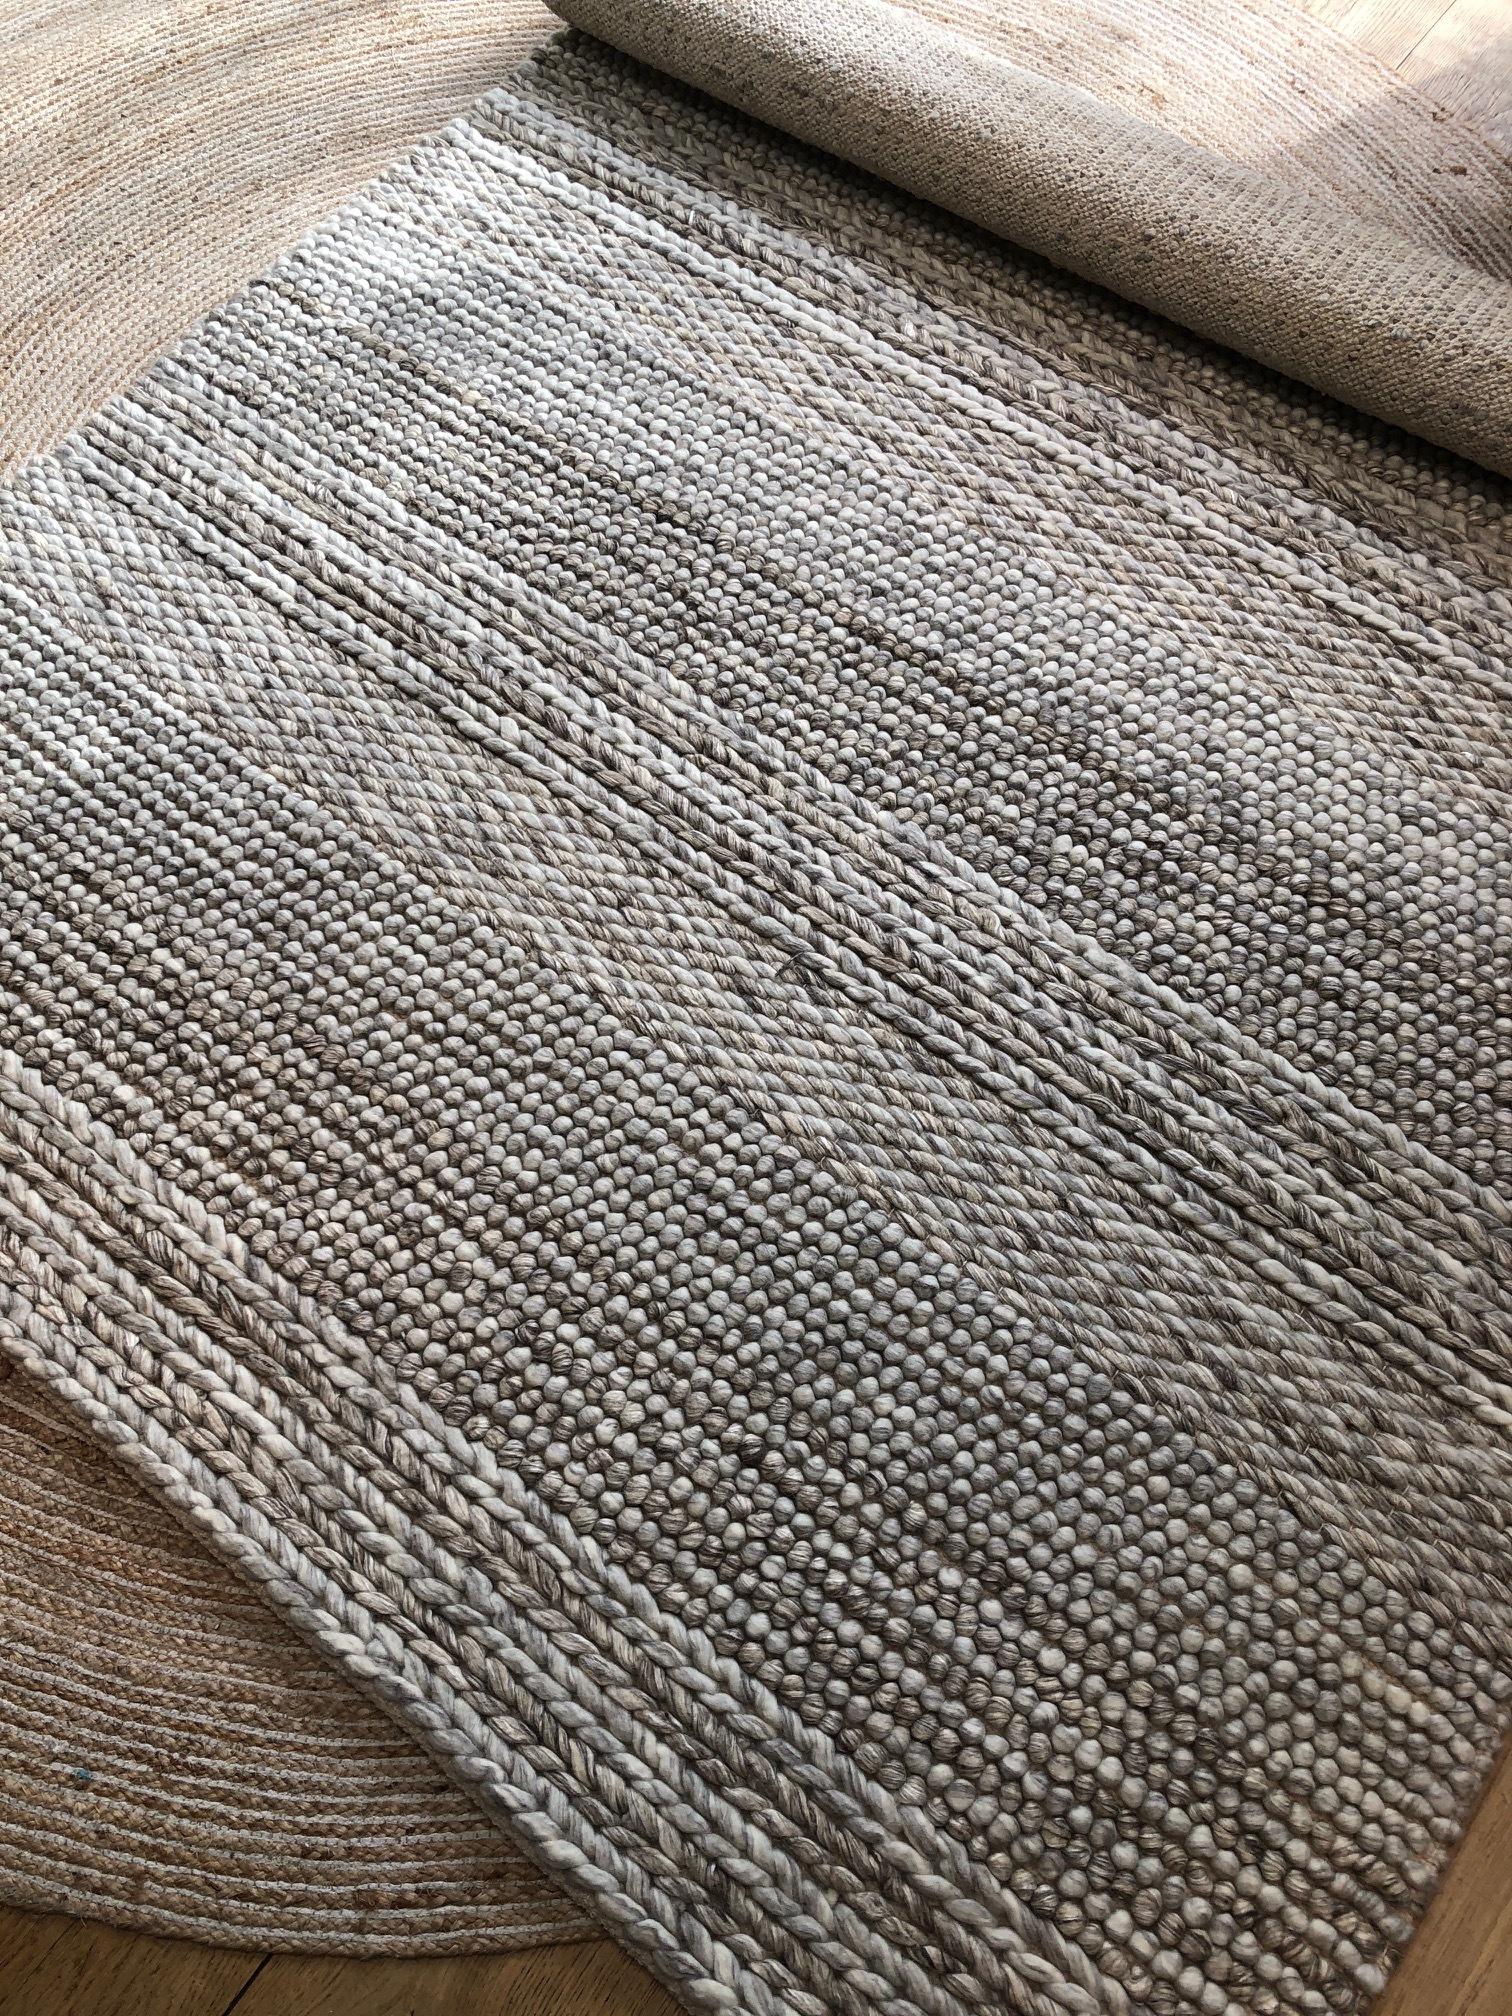 new zealand wool mixed weave.JPG